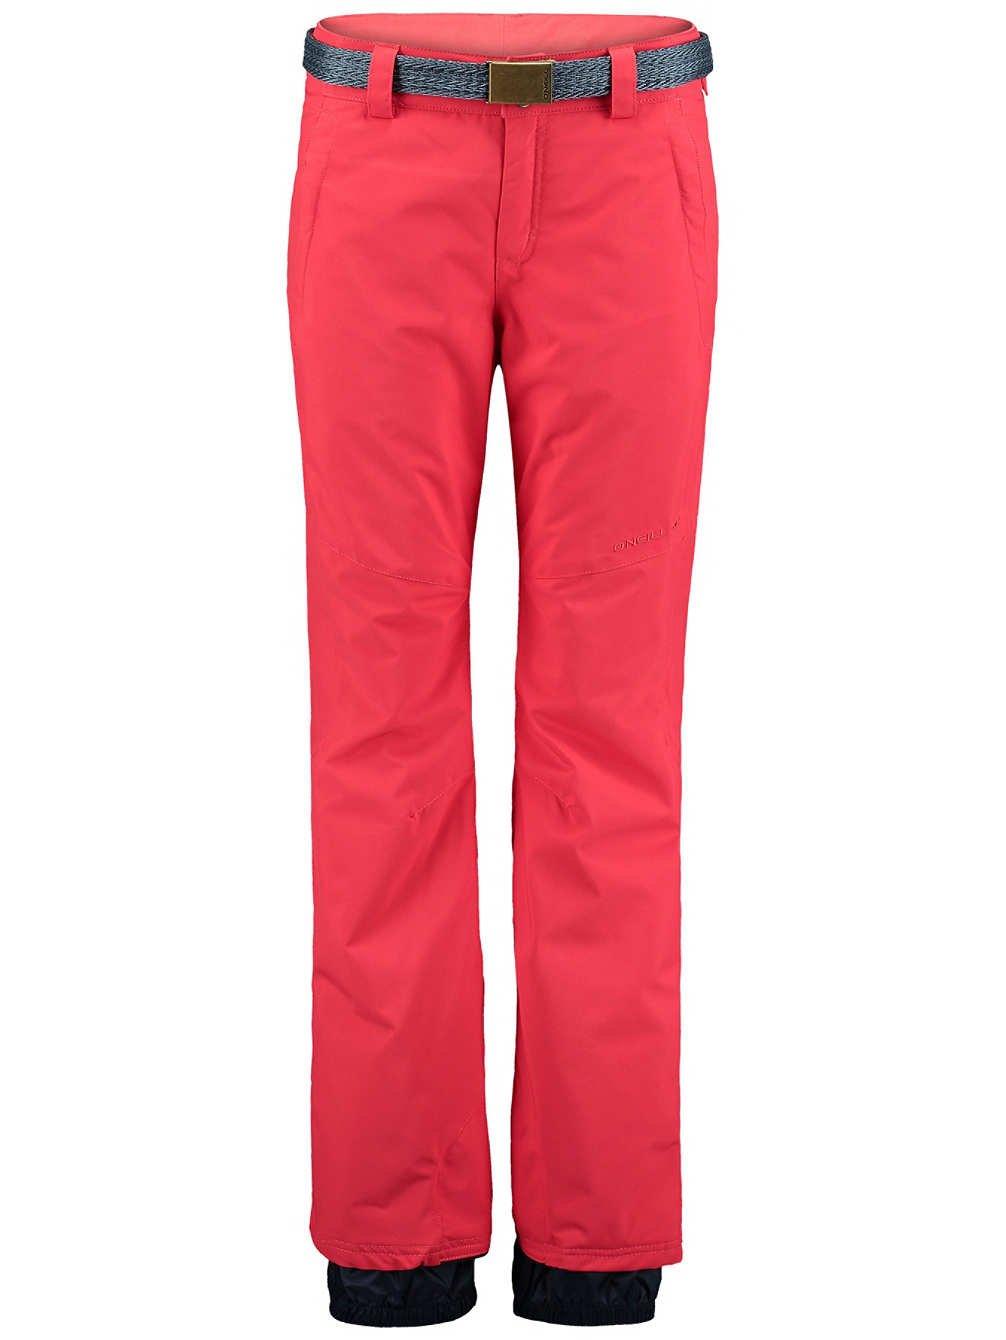 O' Neill–Pantaloni da sci snowboard pantaloni rosso Star isolato ThinsulateTM hyperdry, rot, S O' Neill